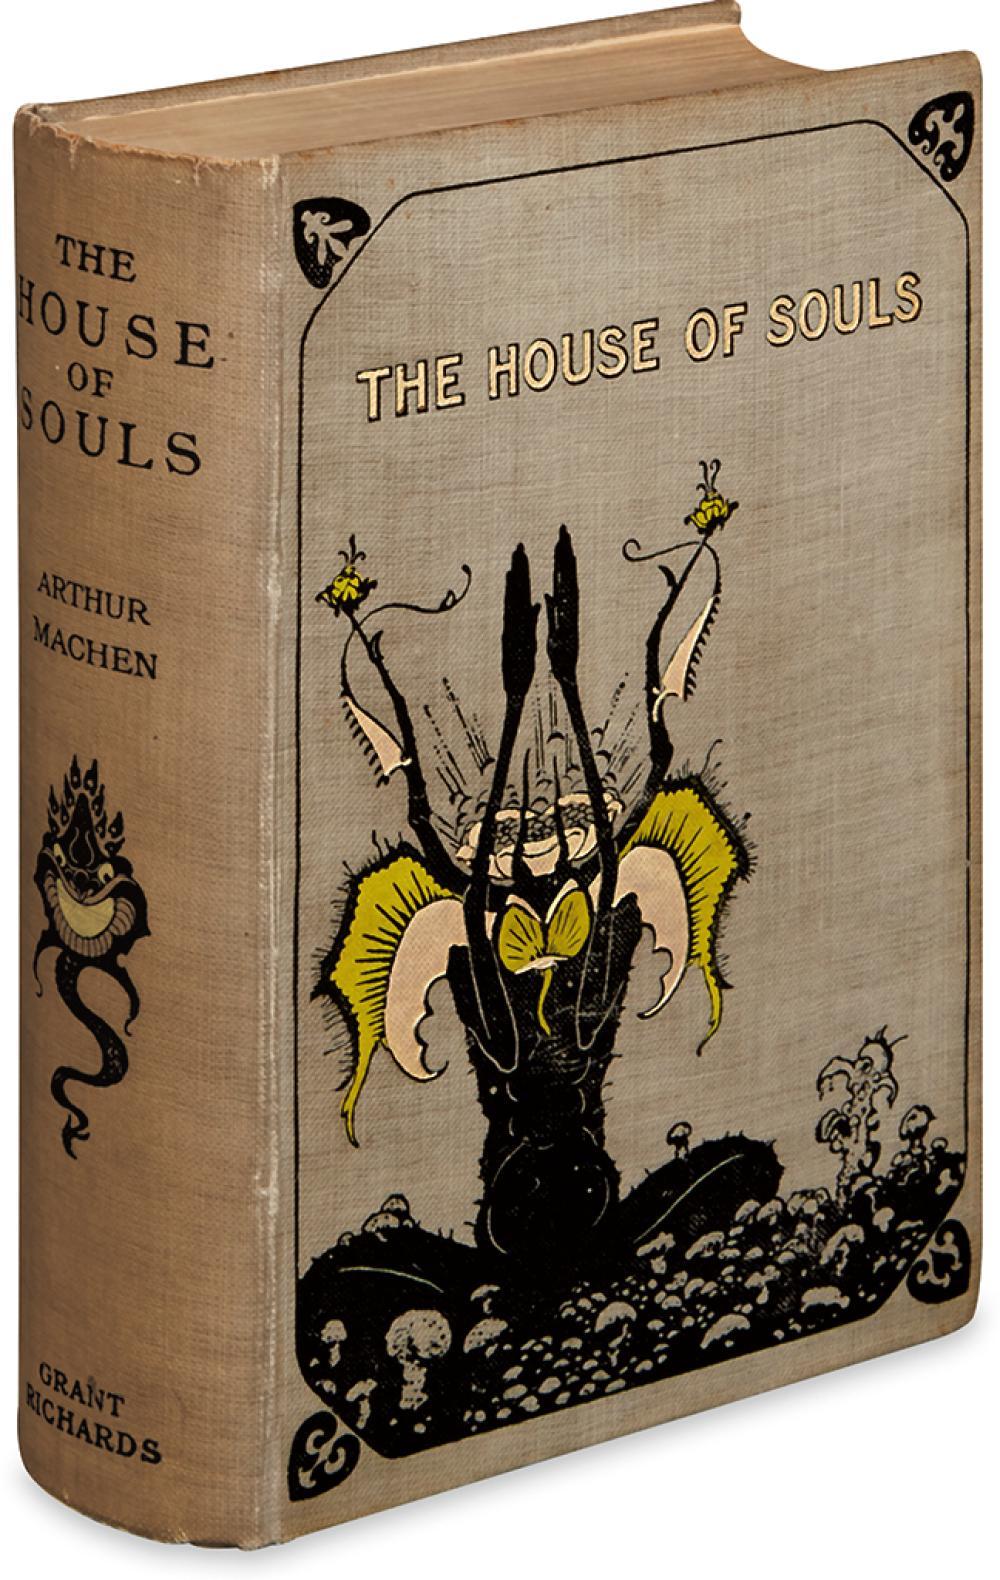 MACHEN, ARTHUR. The House of Souls.